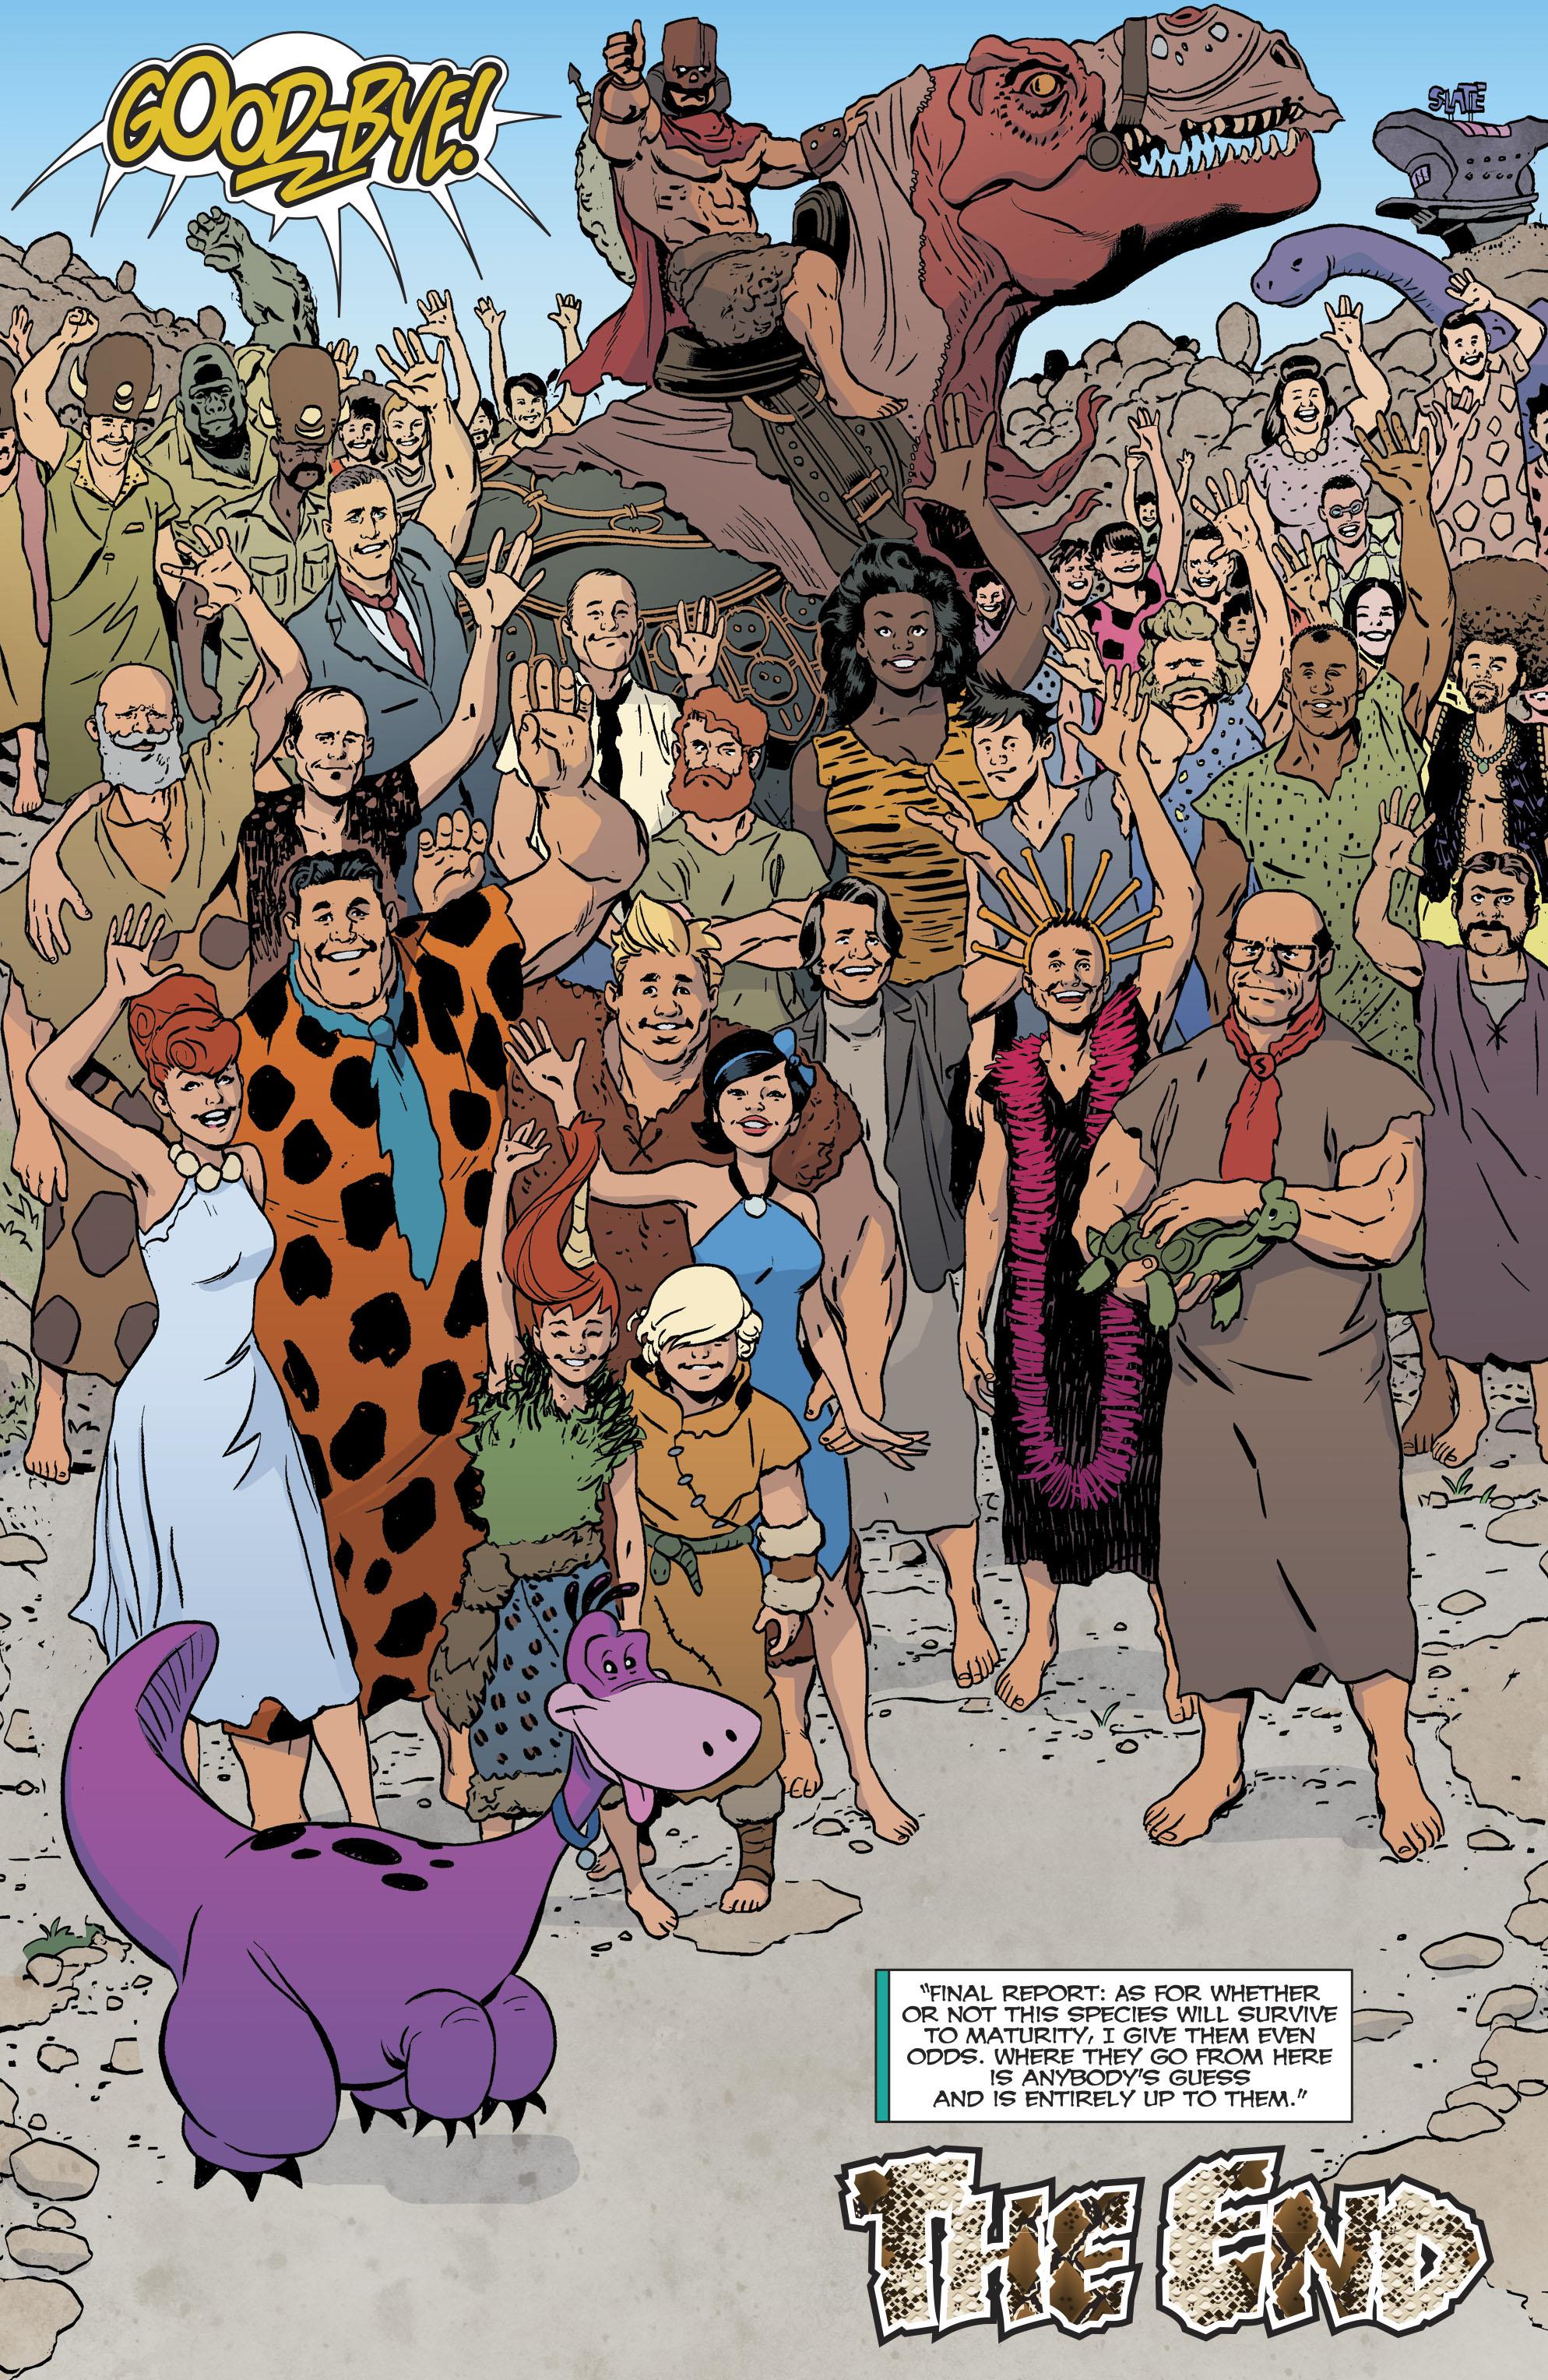 Read online The Flintstones comic -  Issue #12 - 25